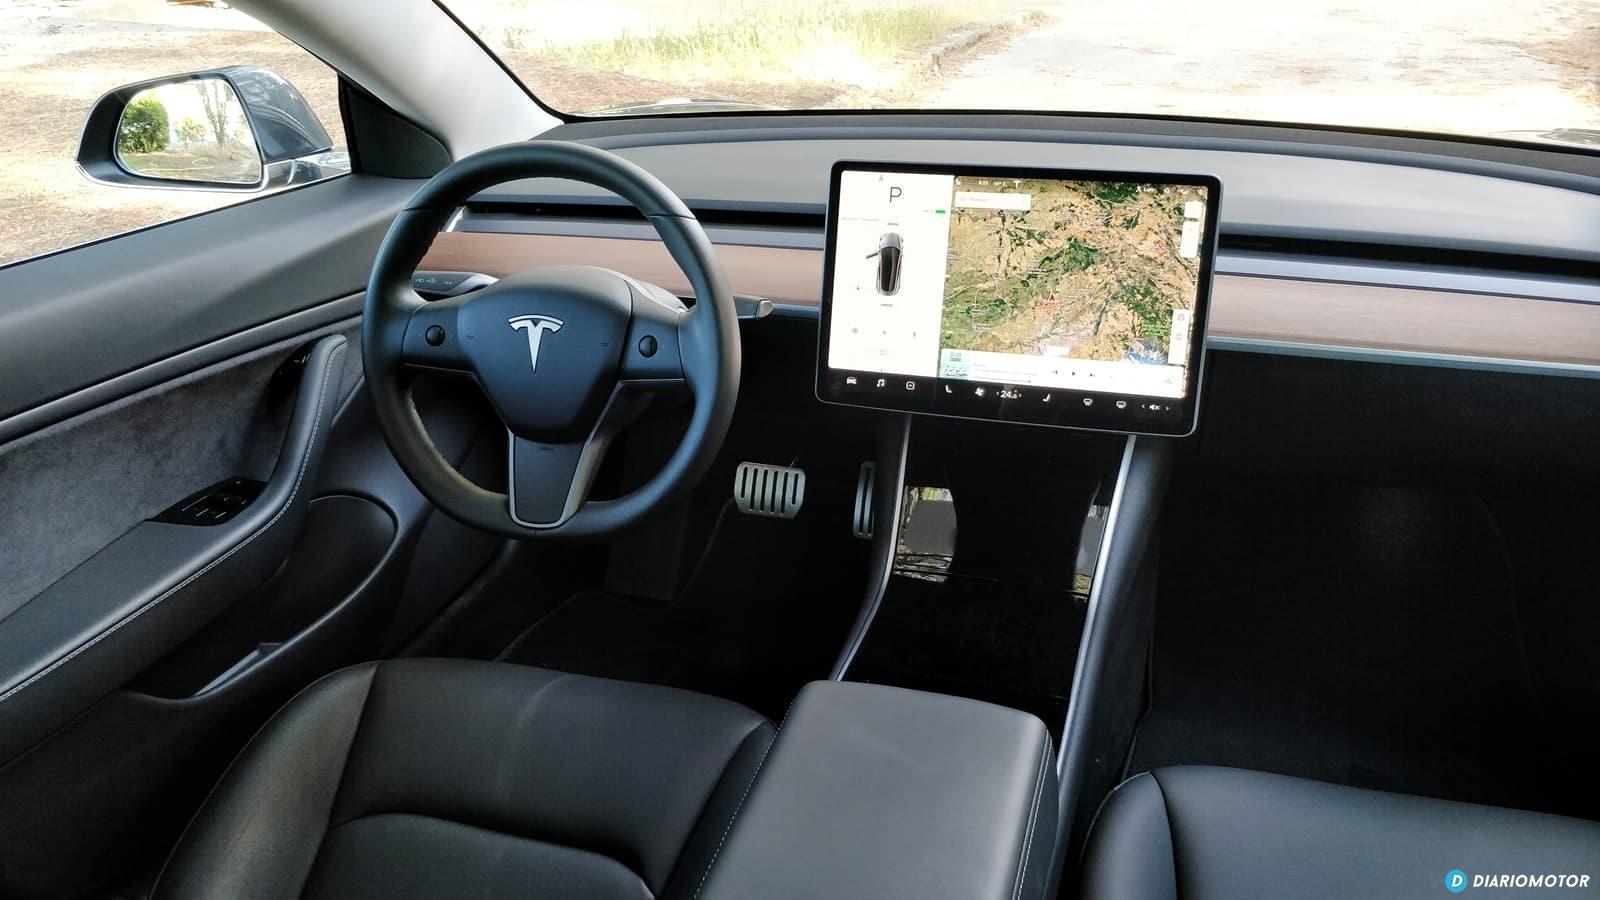 Tesla Model 3 Vs Alfa Romeo Giulia Quadrifoglio 0619 014